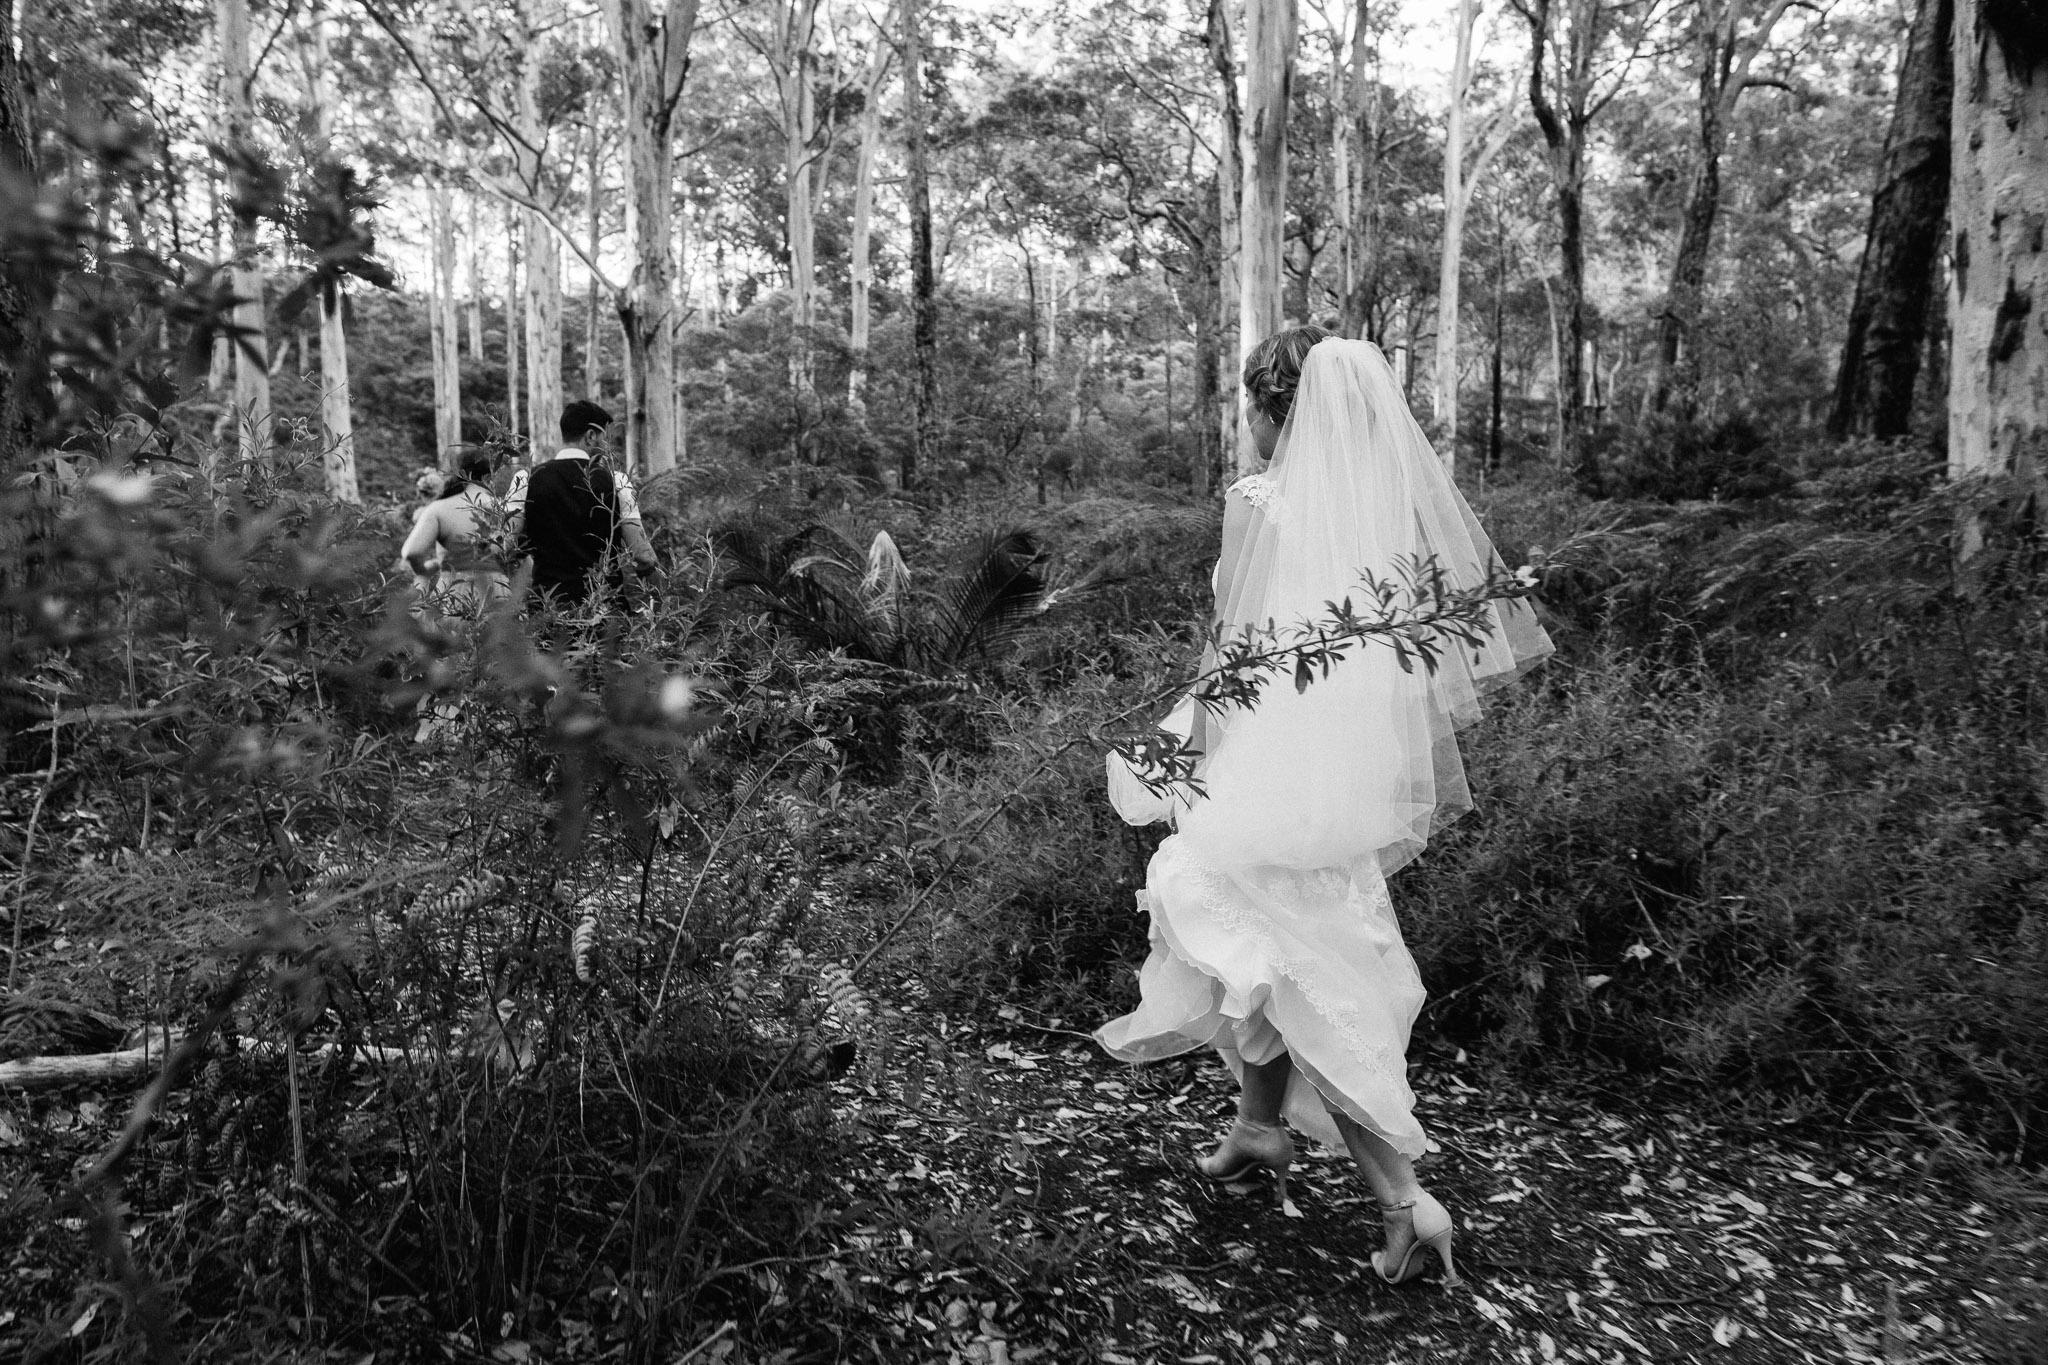 Boronup Forest-Margaret River wedding.jpg